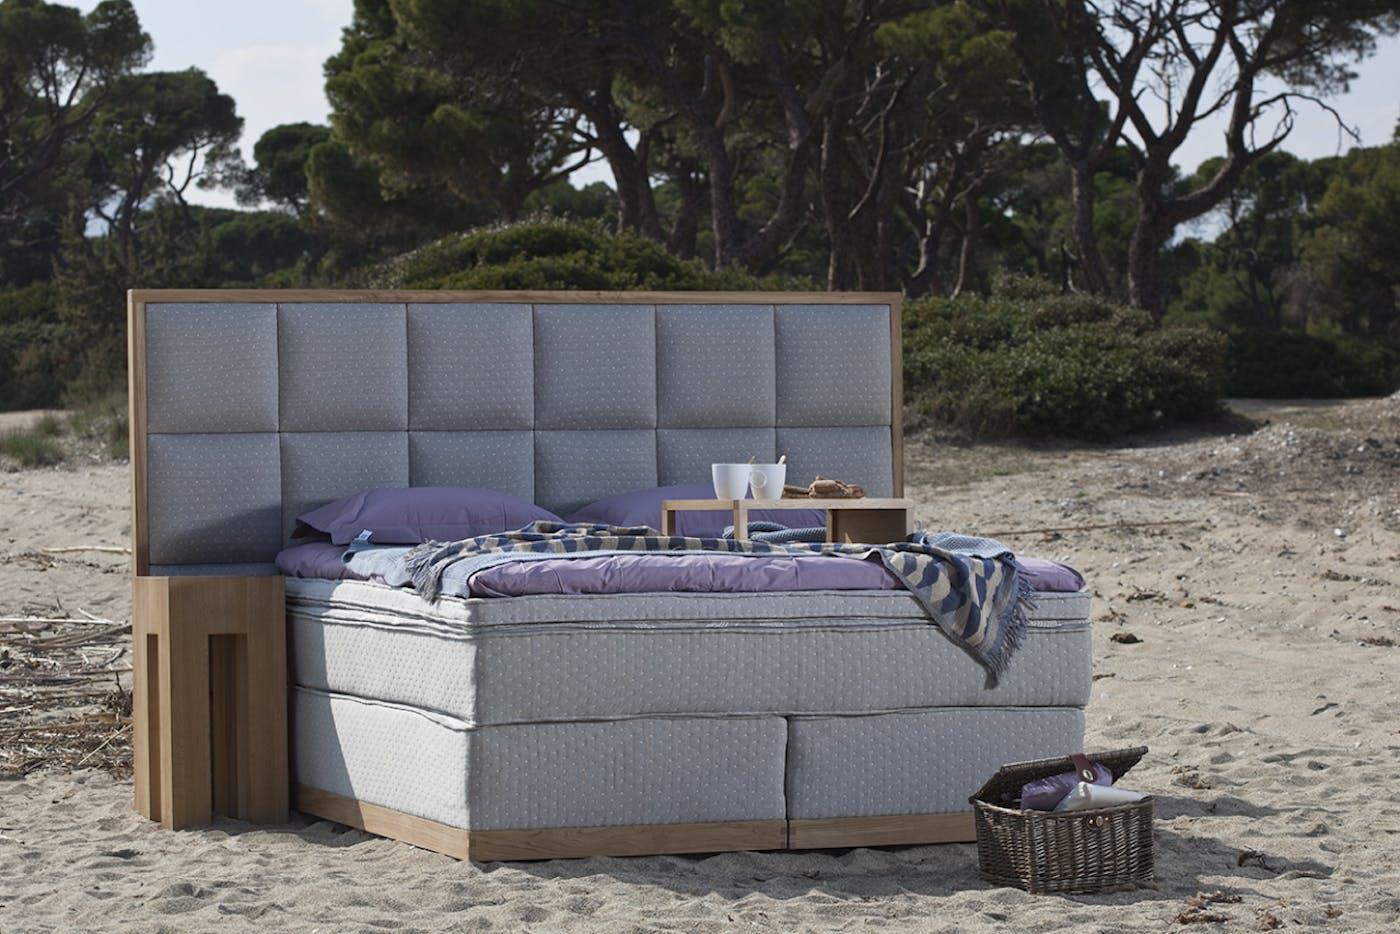 Triton bedsystem gray on beach